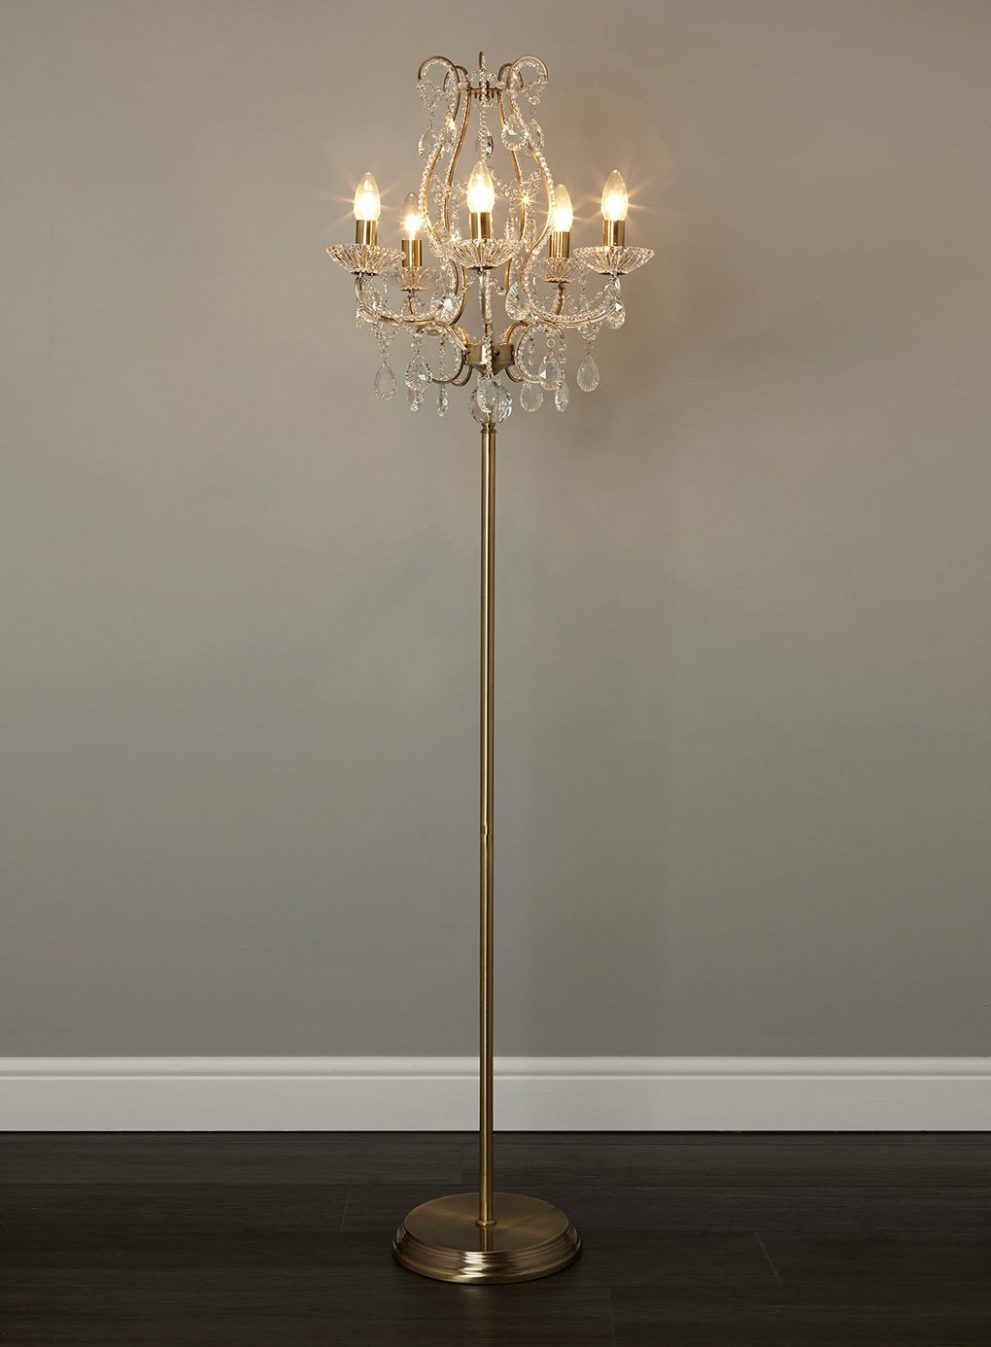 Chandelier Floor Lamps Uk Images Home Furniture Ideas With Regard To Chandelier Standing Lamps (Image 3 of 25)